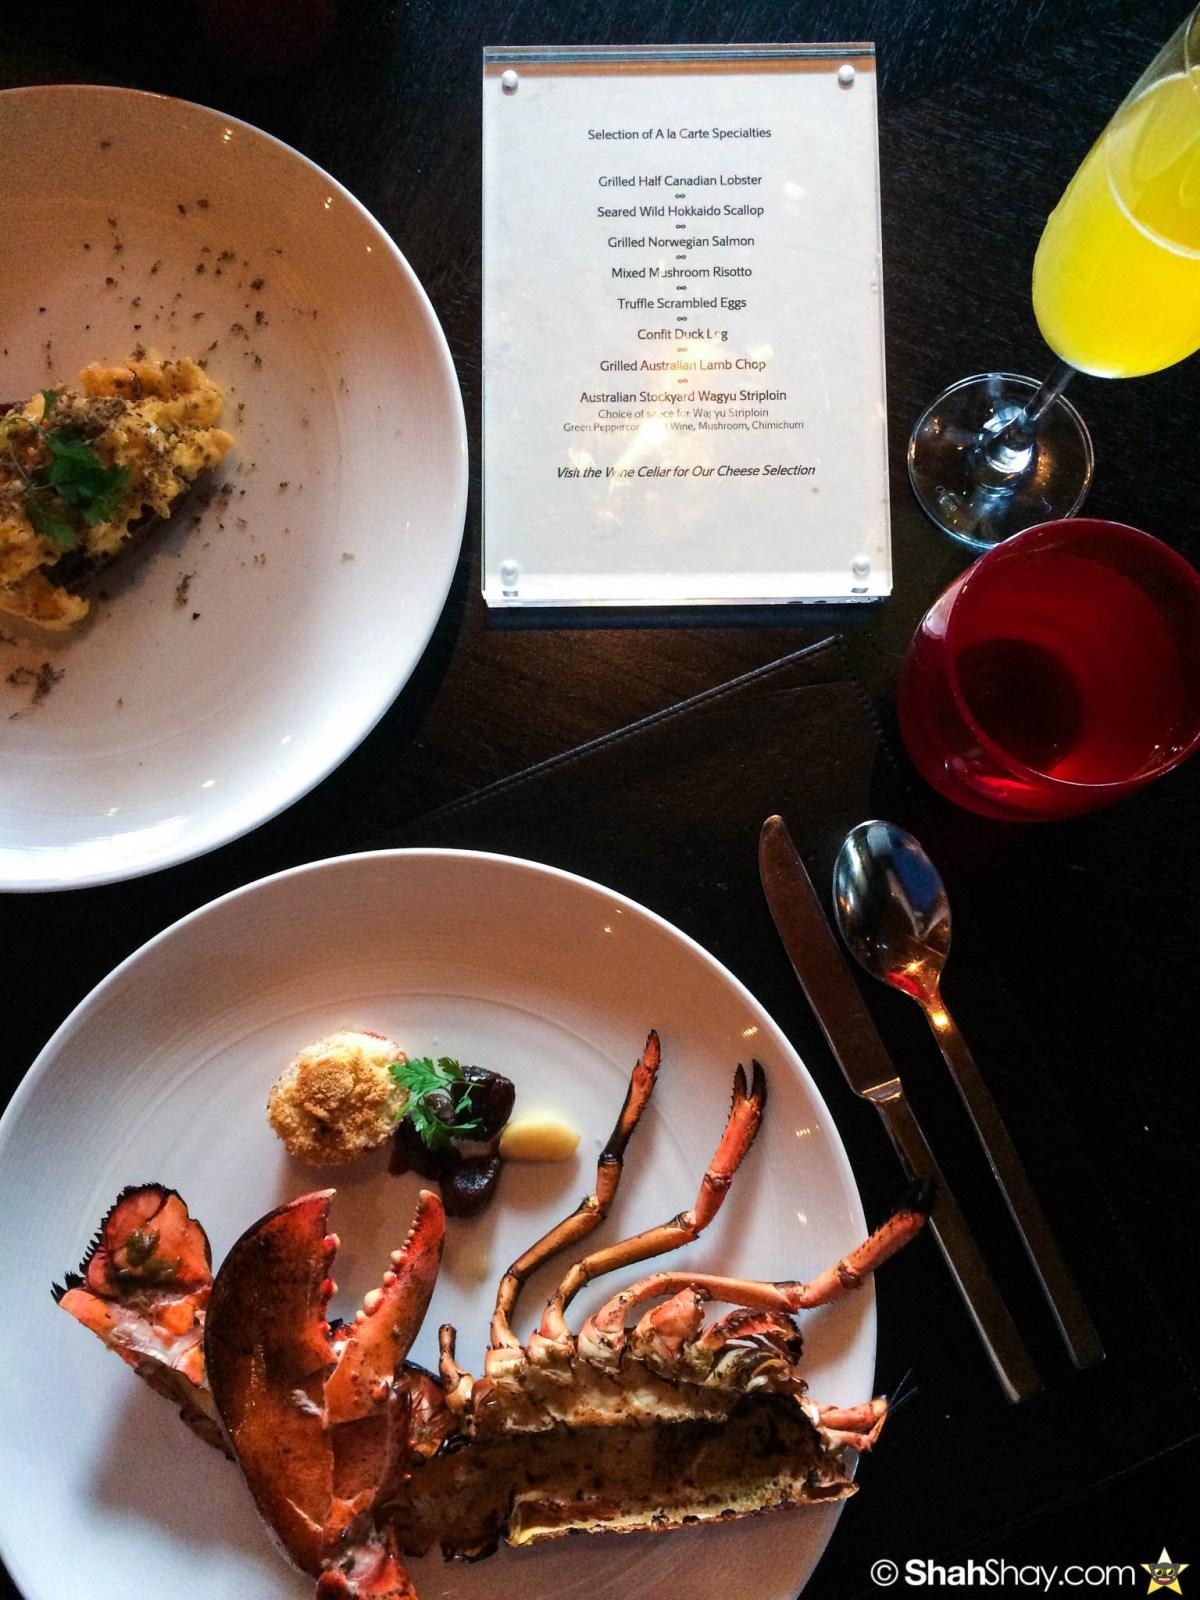 Sunday Brunch Bangkok - Fabulous Brunch Buffet Spread at The District - Lobster Truffle eggs